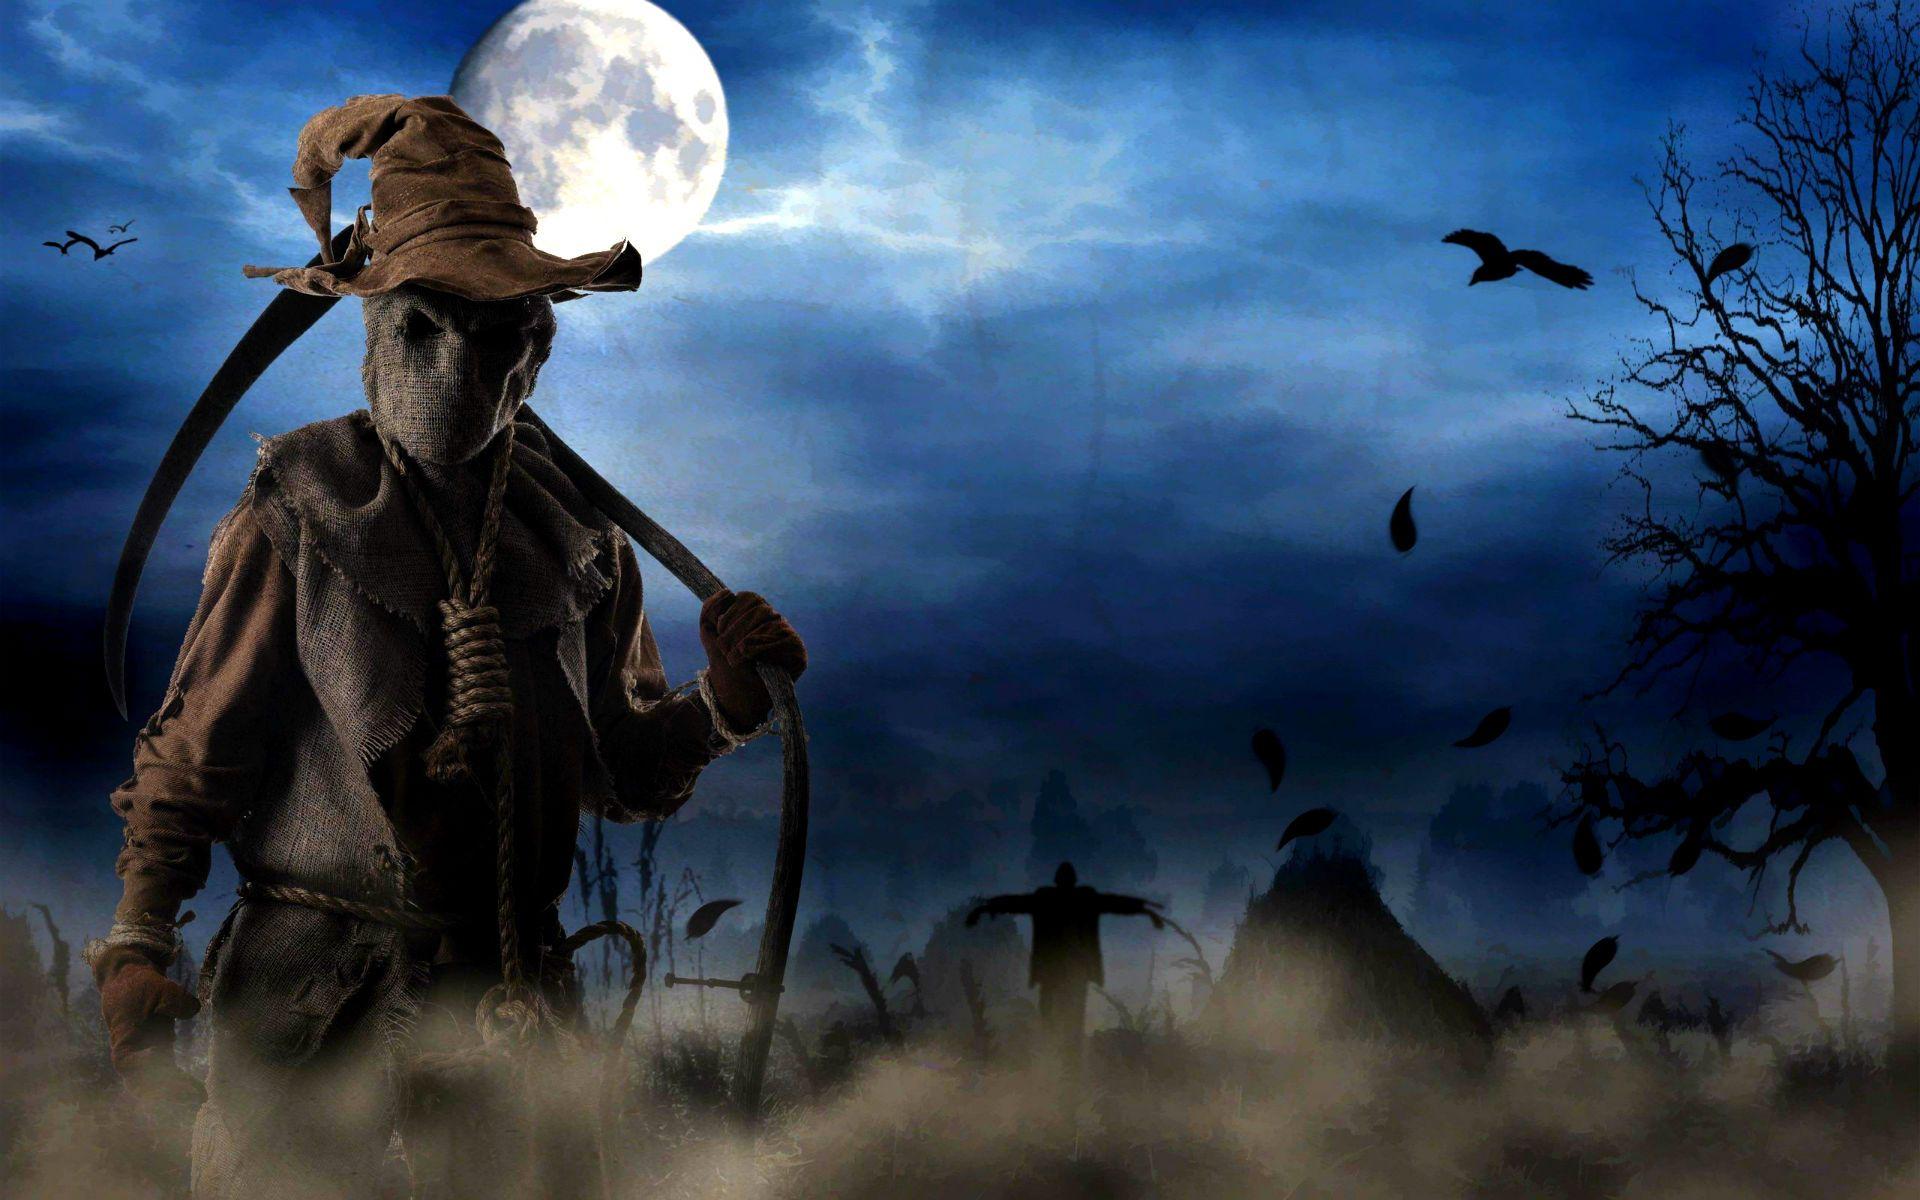 Eerie Halloween Scary Halloween Wallpaper Download Free Scary Halloween Hd